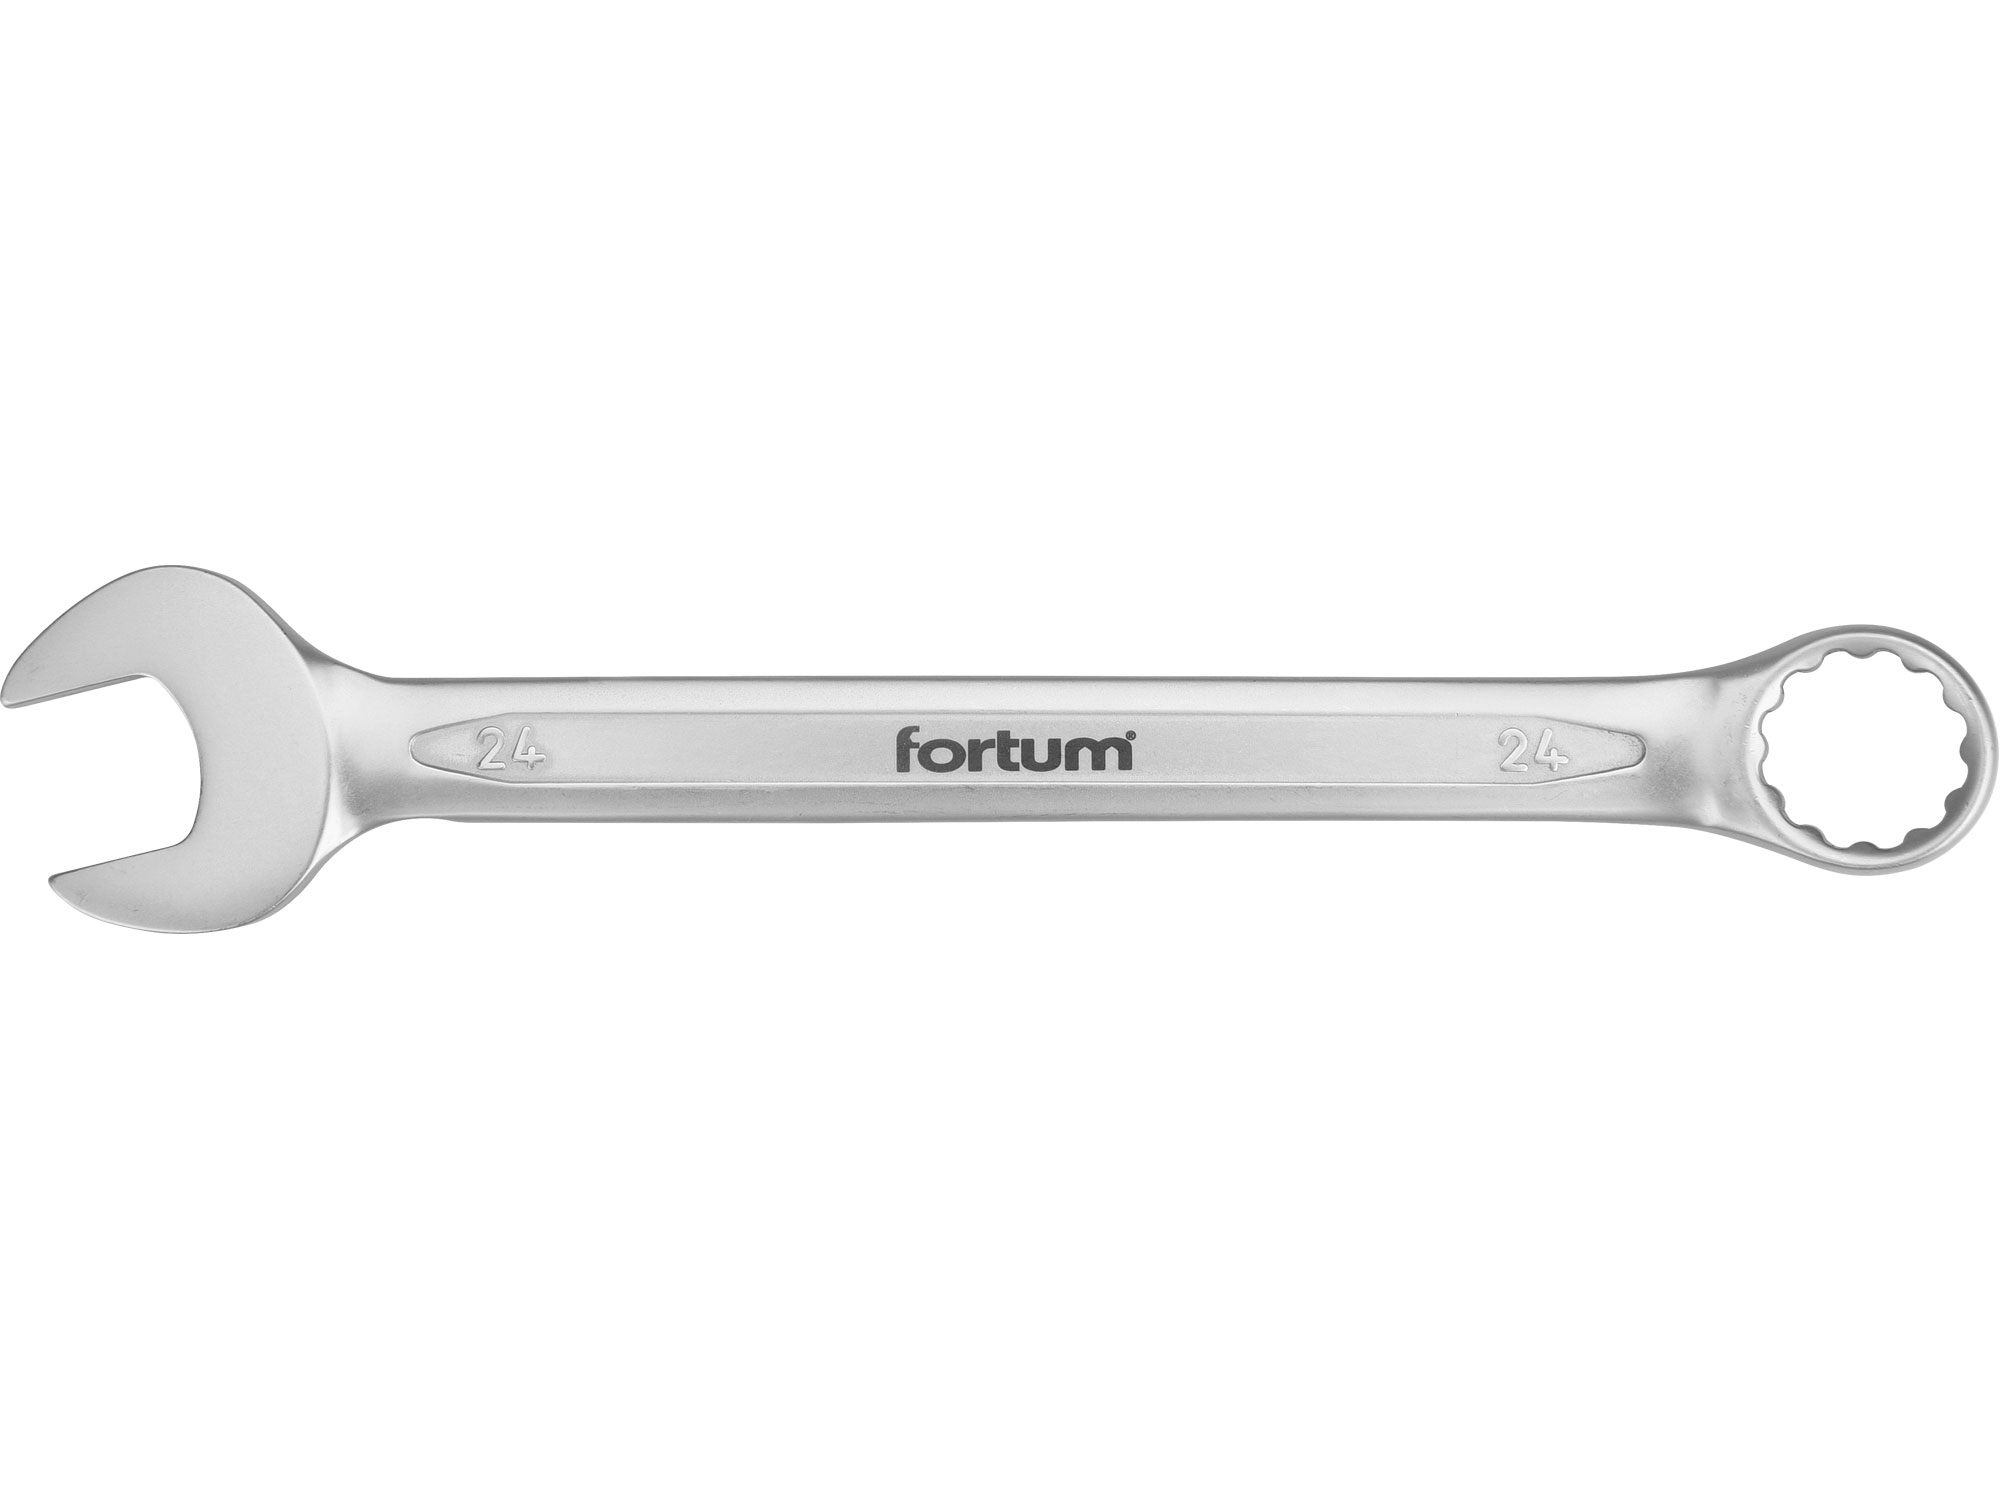 klíč očkoplochý, 24mm, L 290mm, FORTUM 4730224